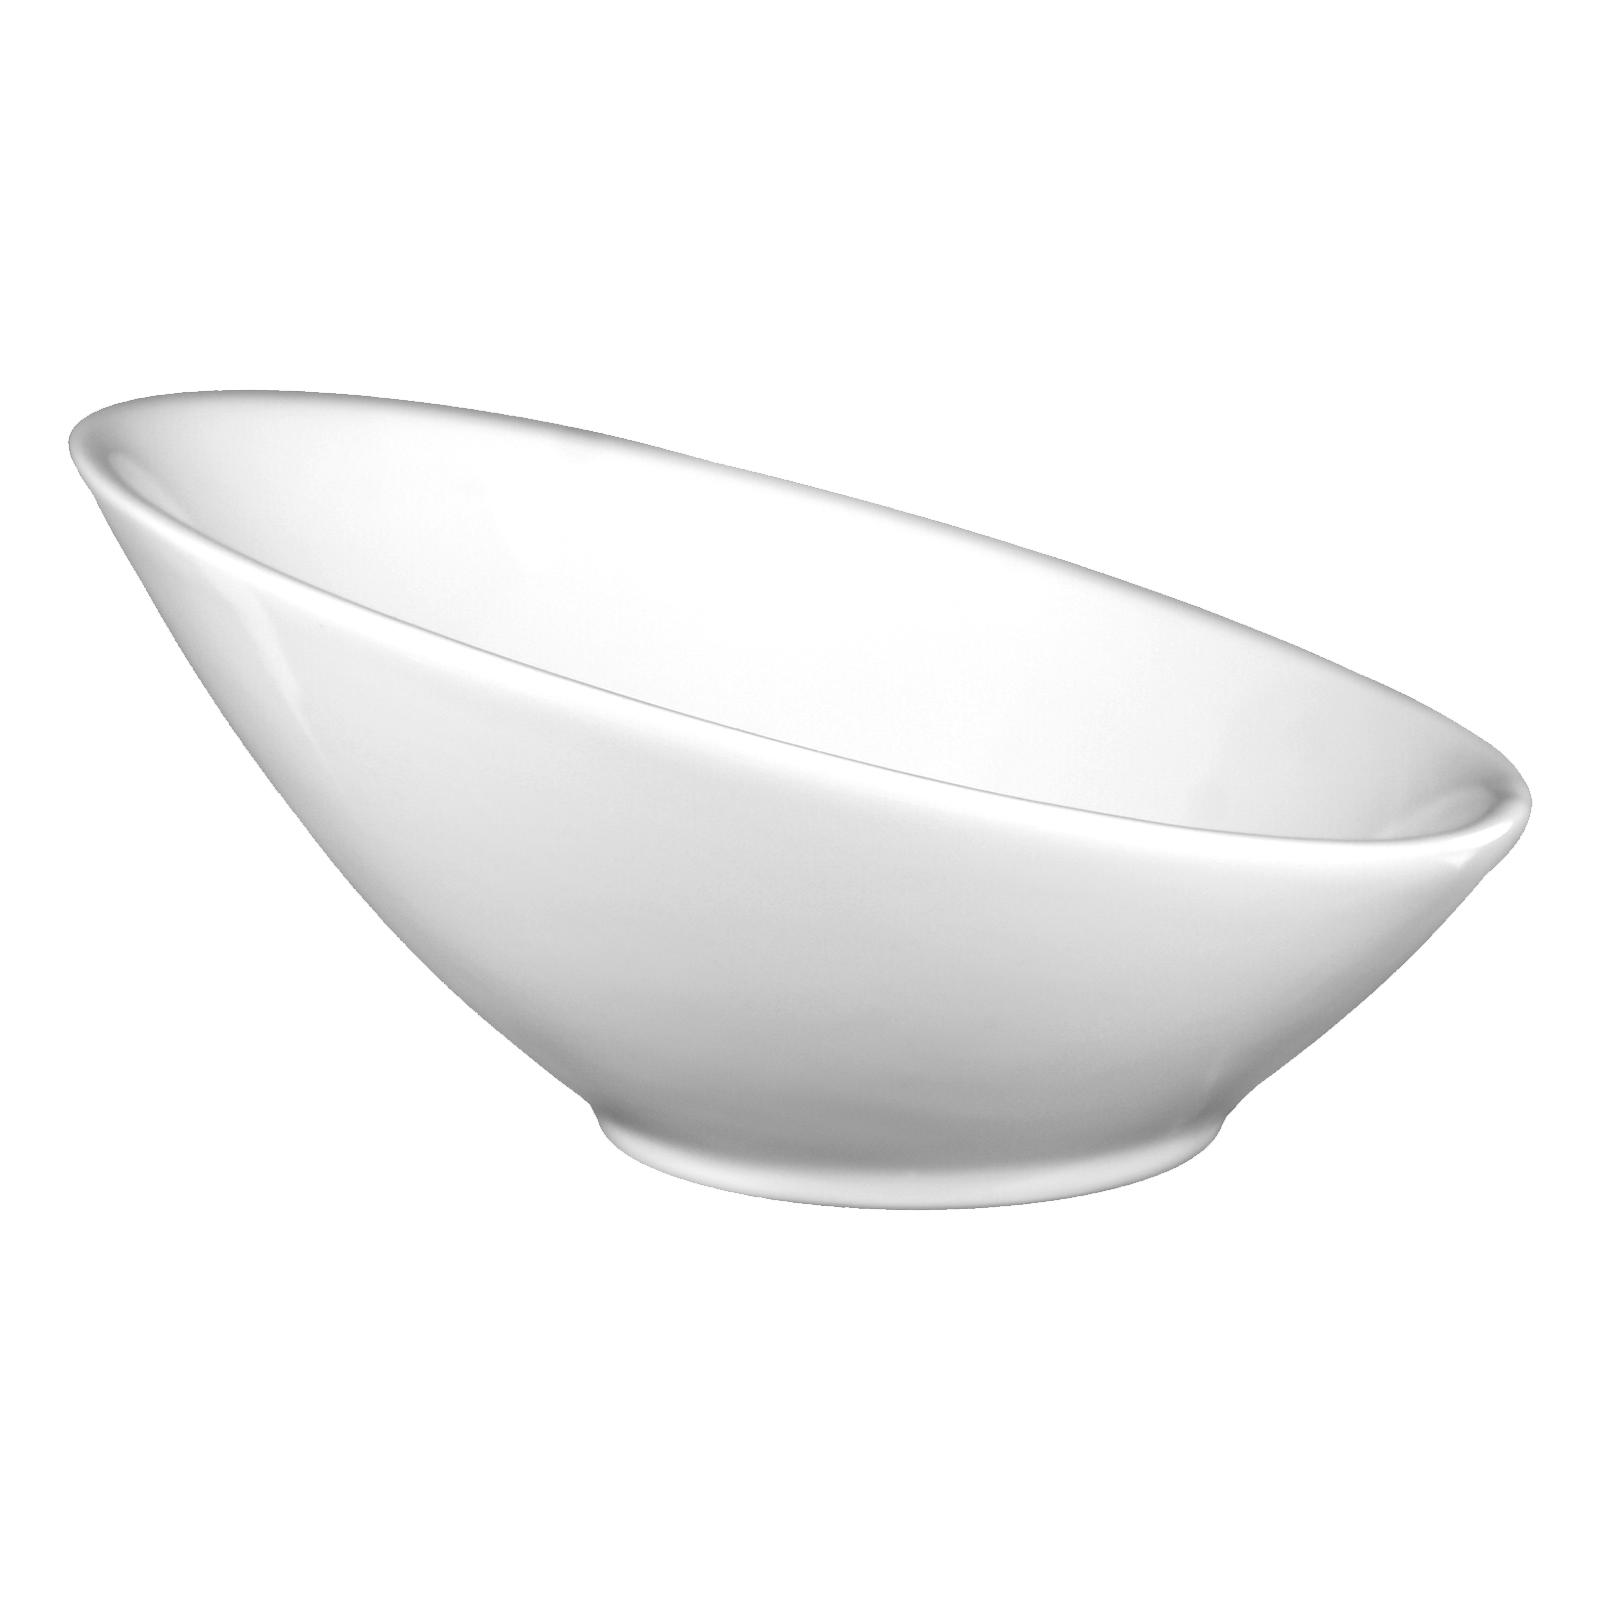 International Tableware FA-44 china, bowl,  0 - 8 oz